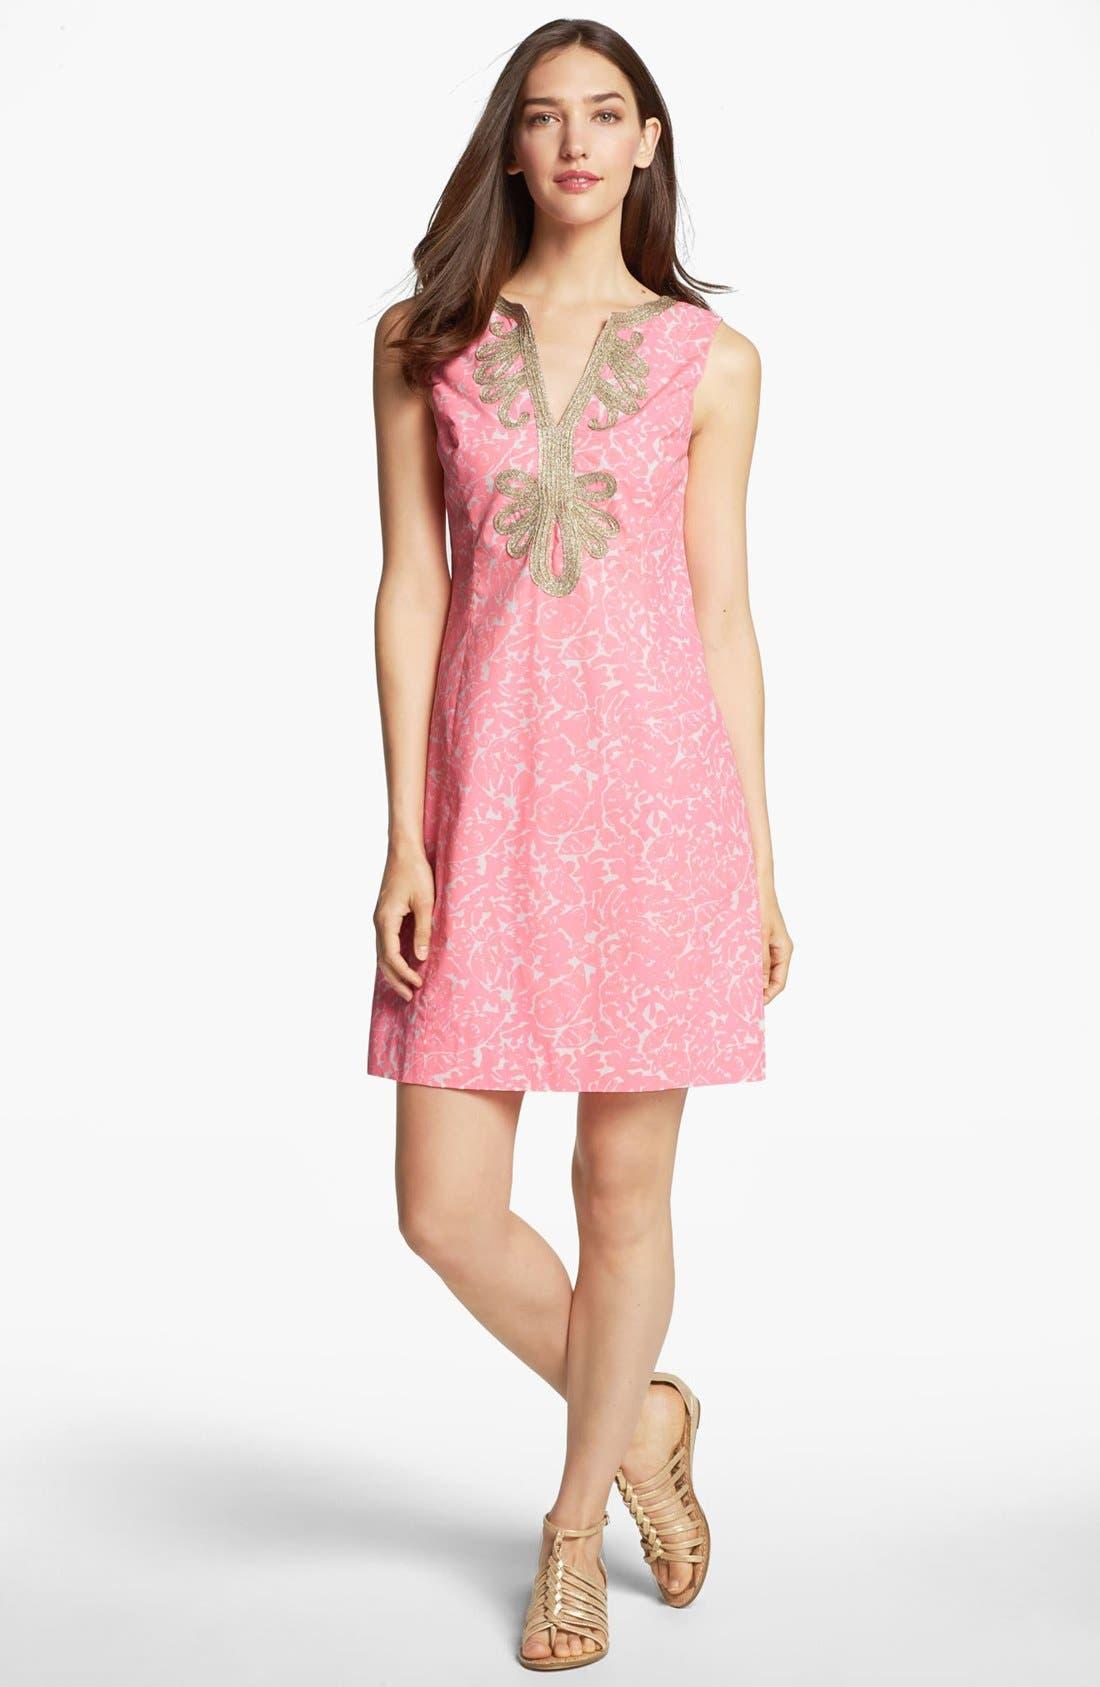 Main Image - Lilly Pulitzer® 'Janise' Embellished Print Shift Dress